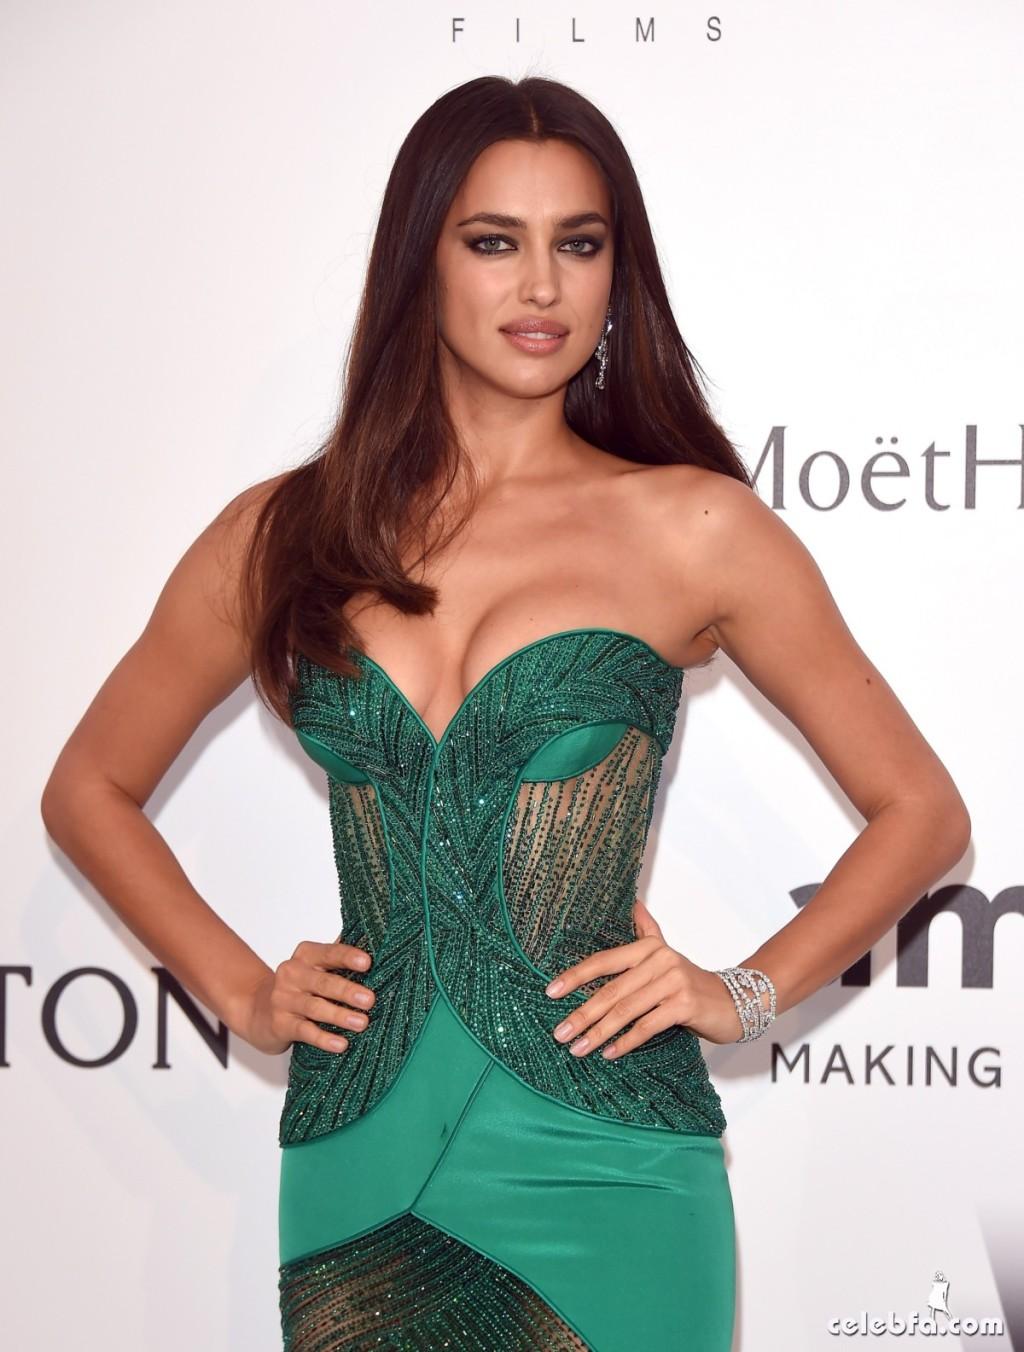 Irina_Shayk_amfAR's Cannes Gala (1)